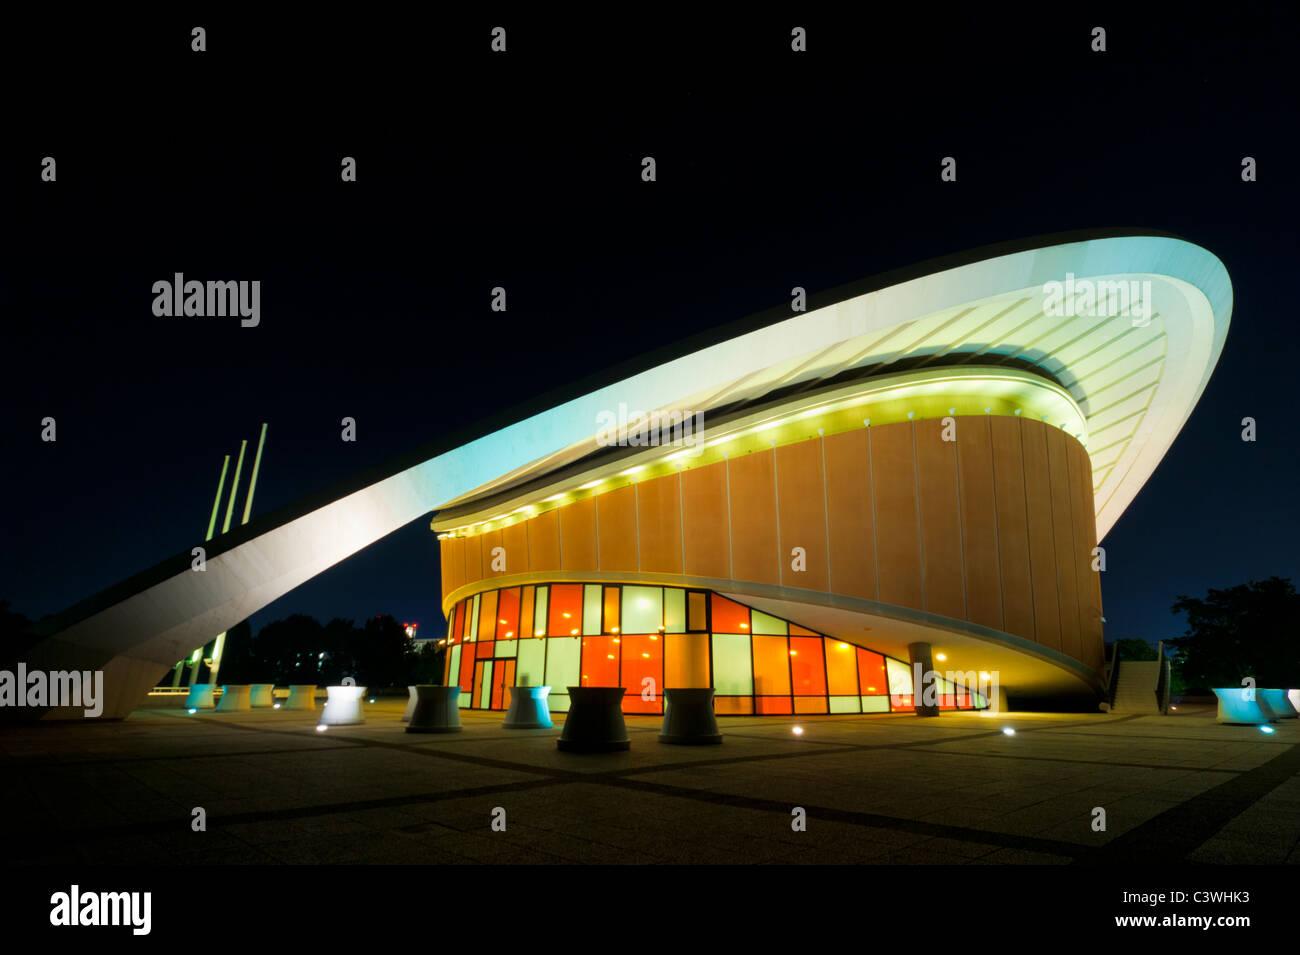 Haus der Kulturen der Welt, Kongresshalle, Congress Hall, Schwangere Auster, Berlin, Germany - Stock Image